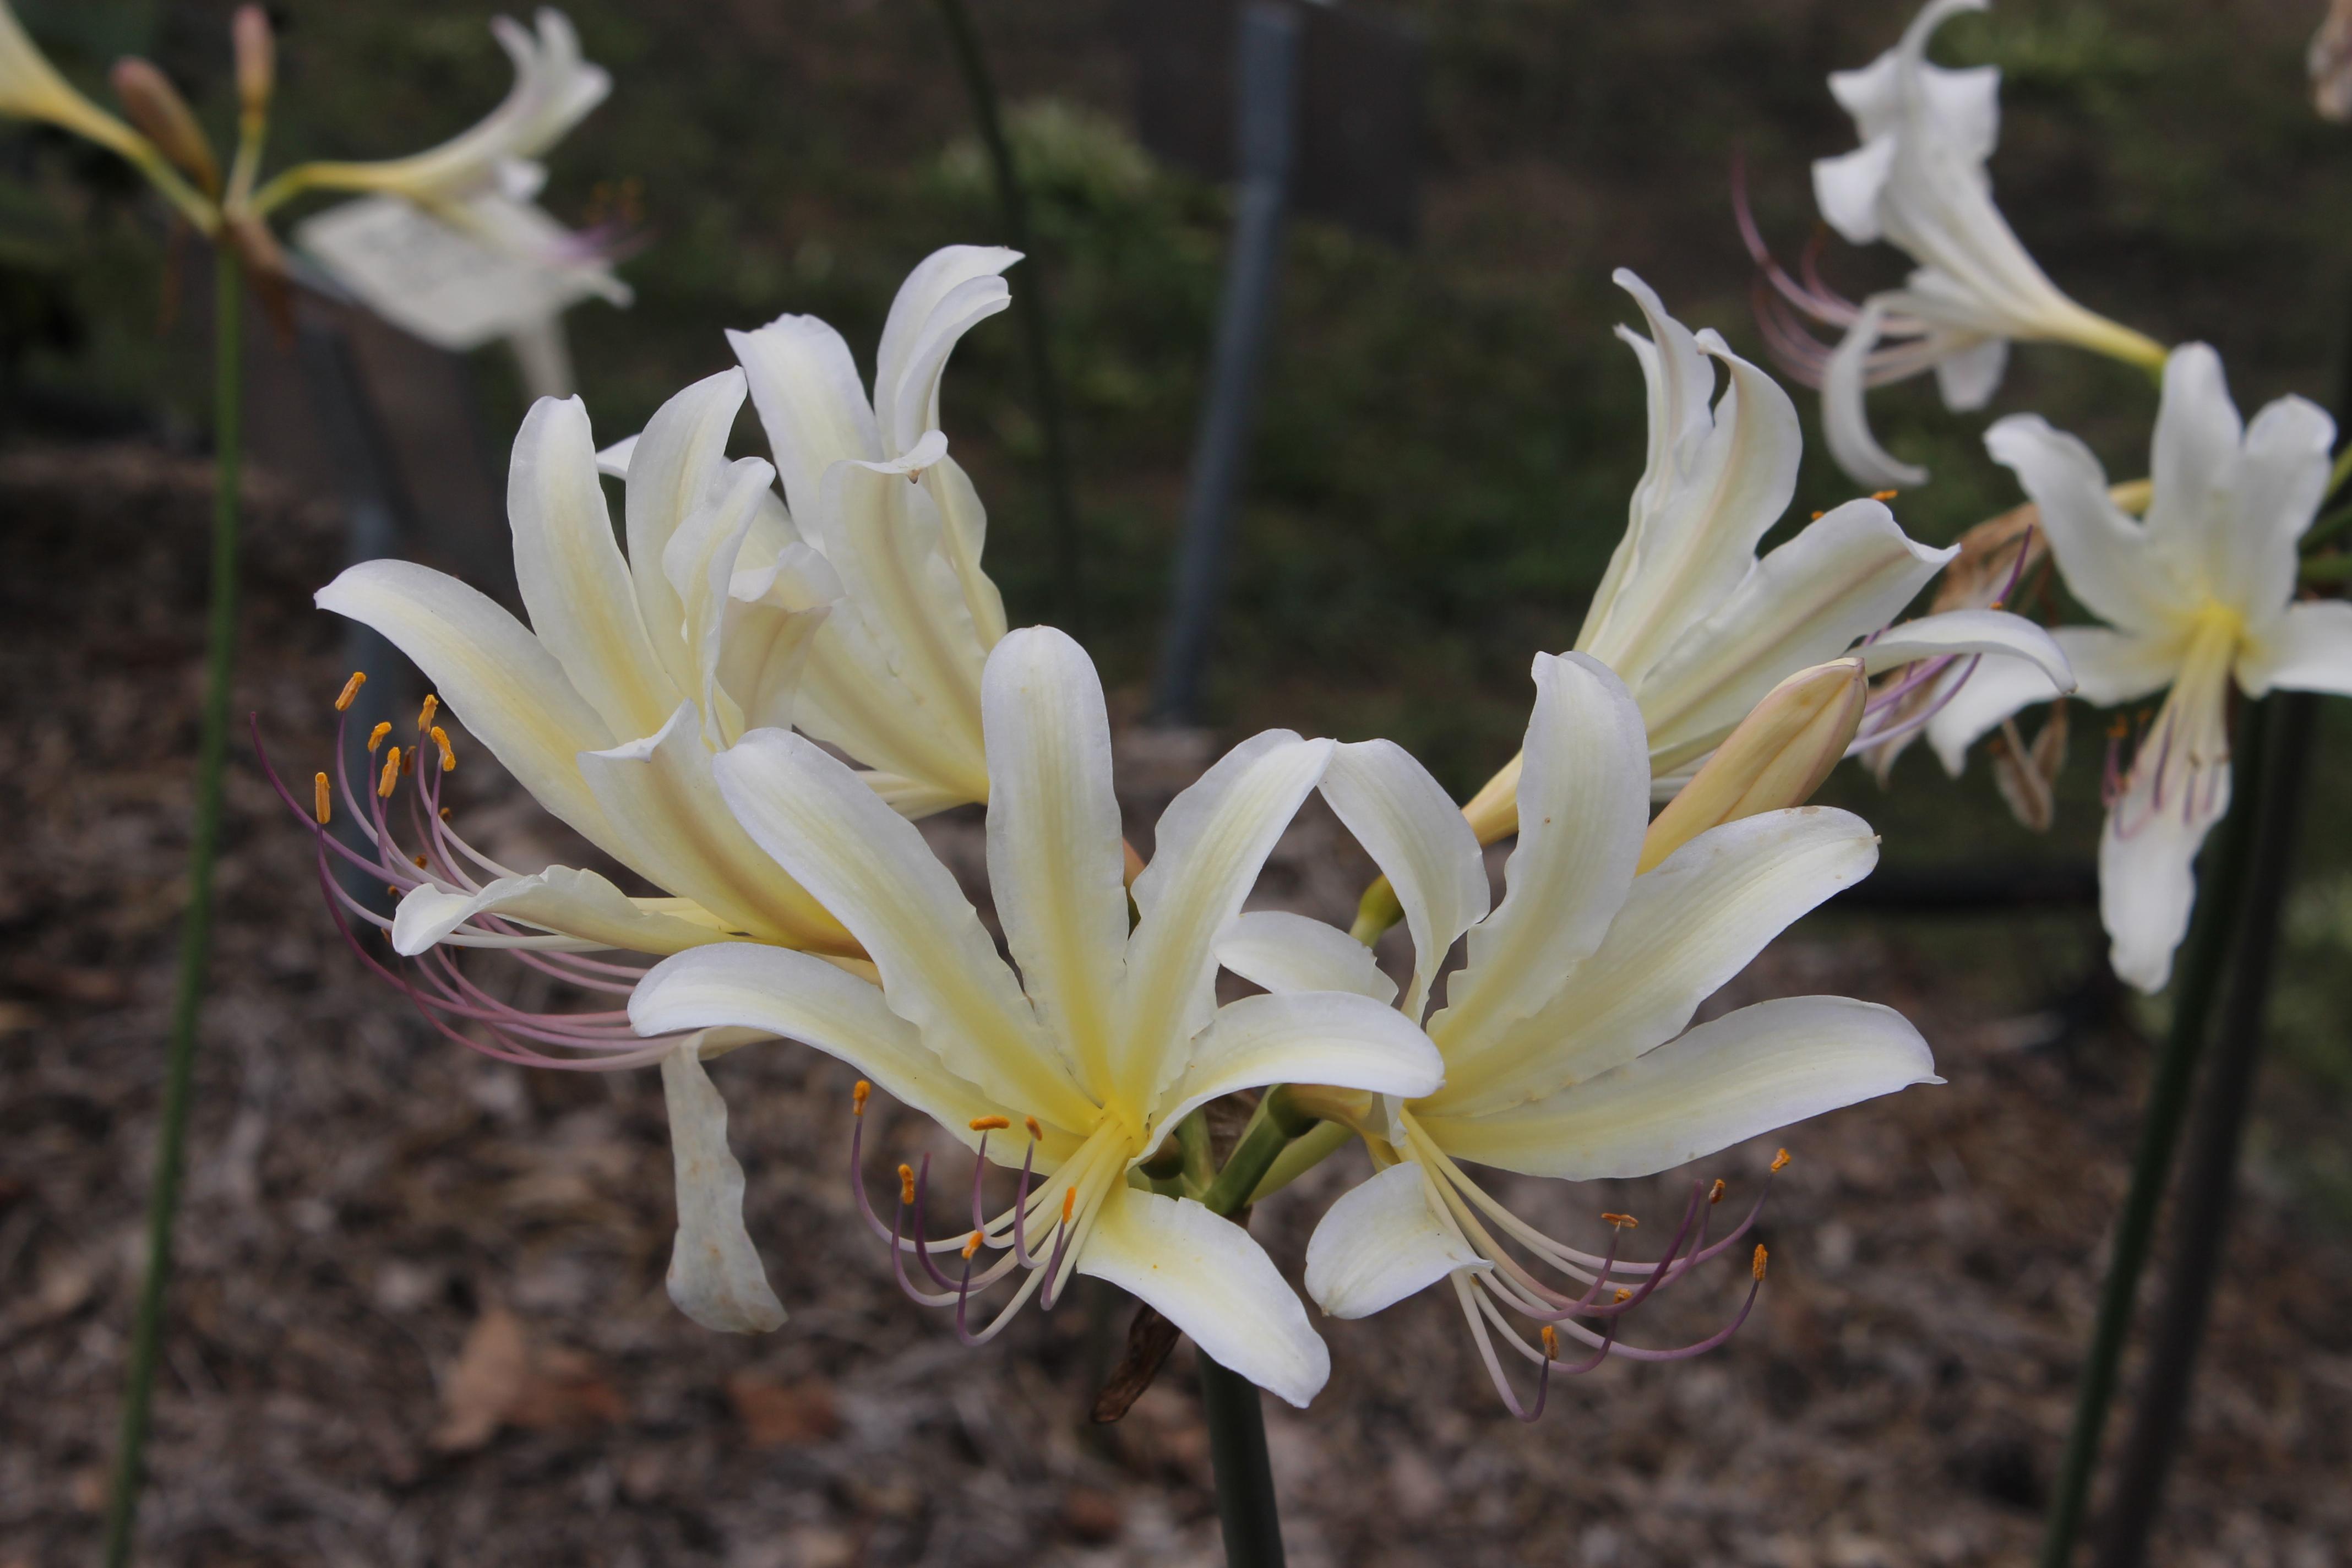 Lycoris x sprengensis 'Lemon Cheesecake' @ JLBG - (aka: Caldwell's Hay-sper) - A Sam Caldwell hybrid of Lycoris sprengeri 'Hayward' x Lycoris chinensis 'Sperryi'